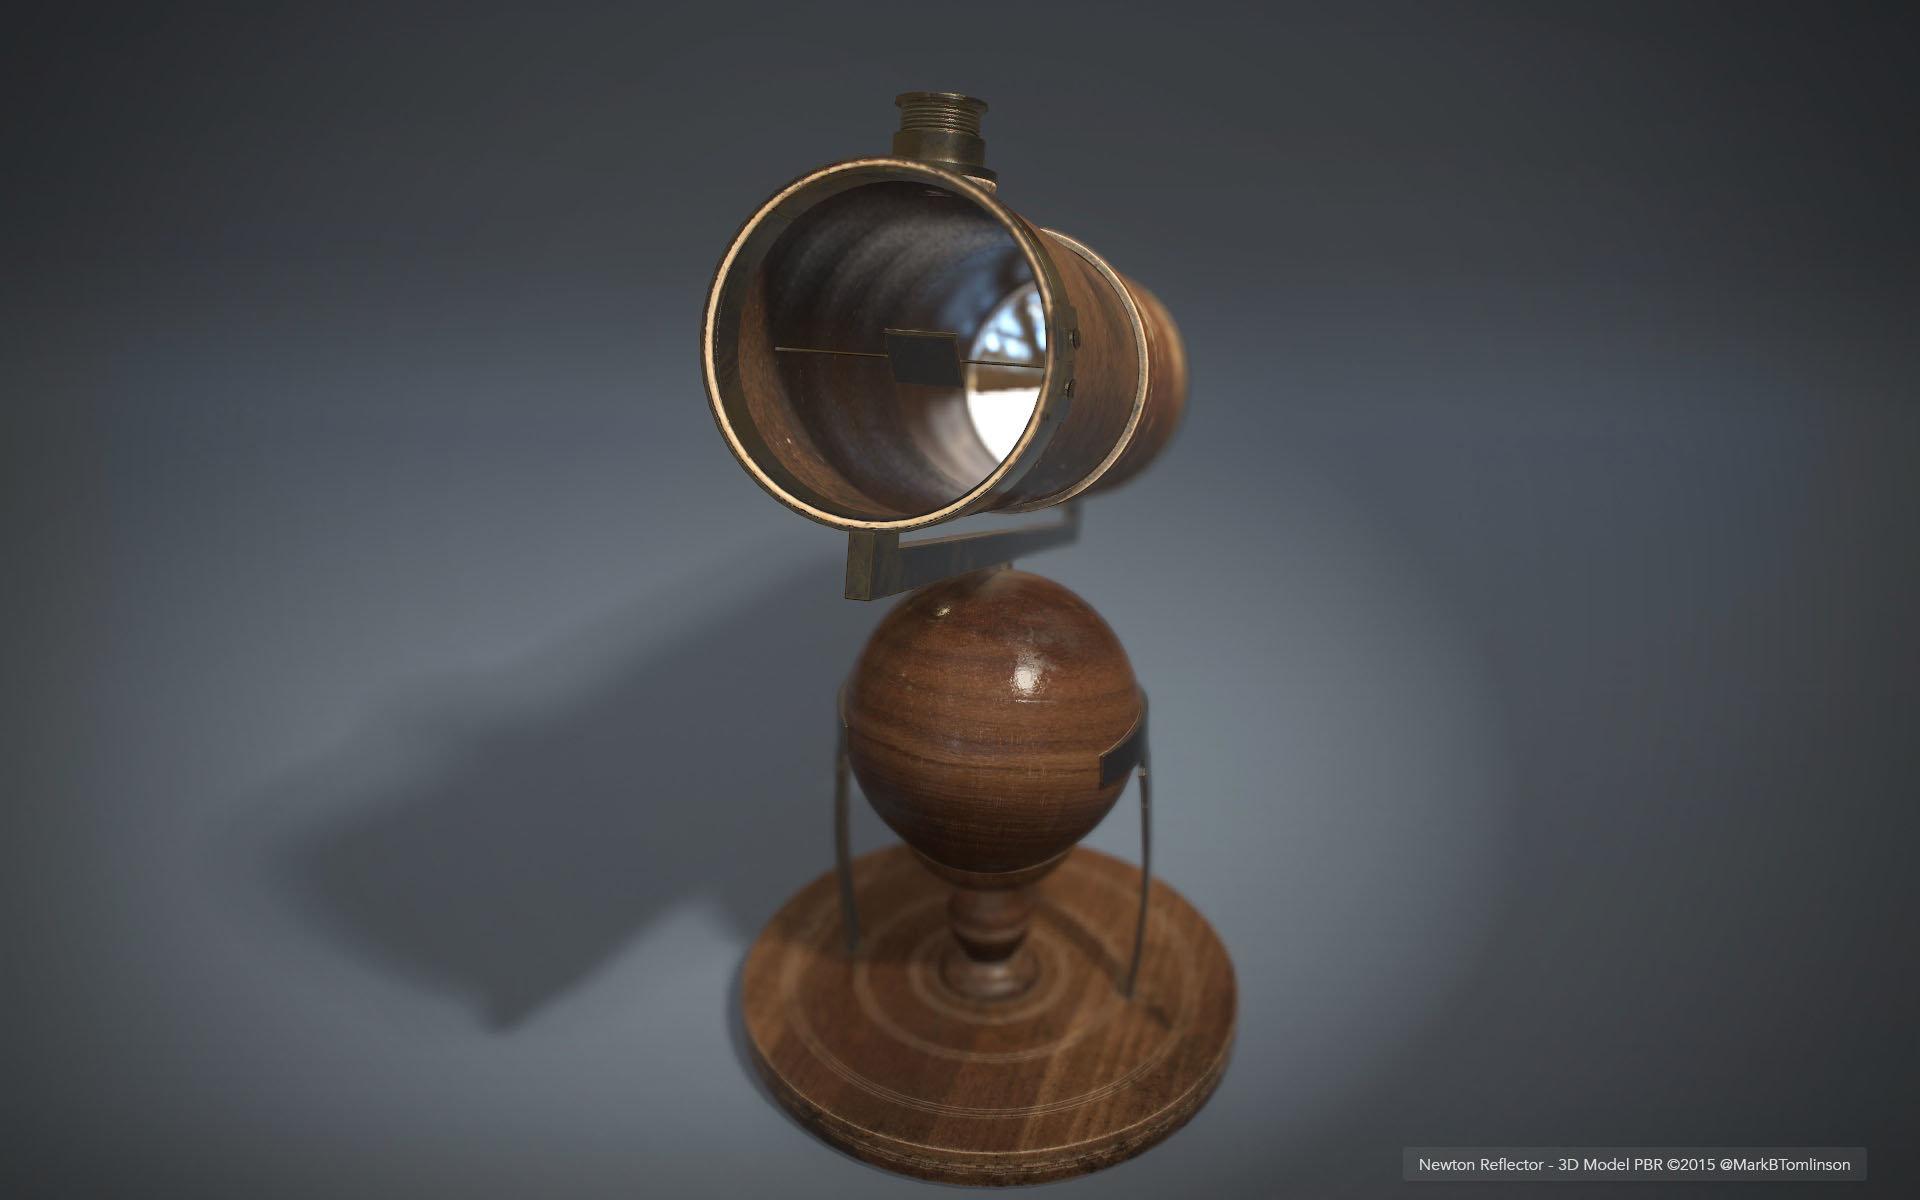 Mark b tomlinson newton reflector pbr render 06